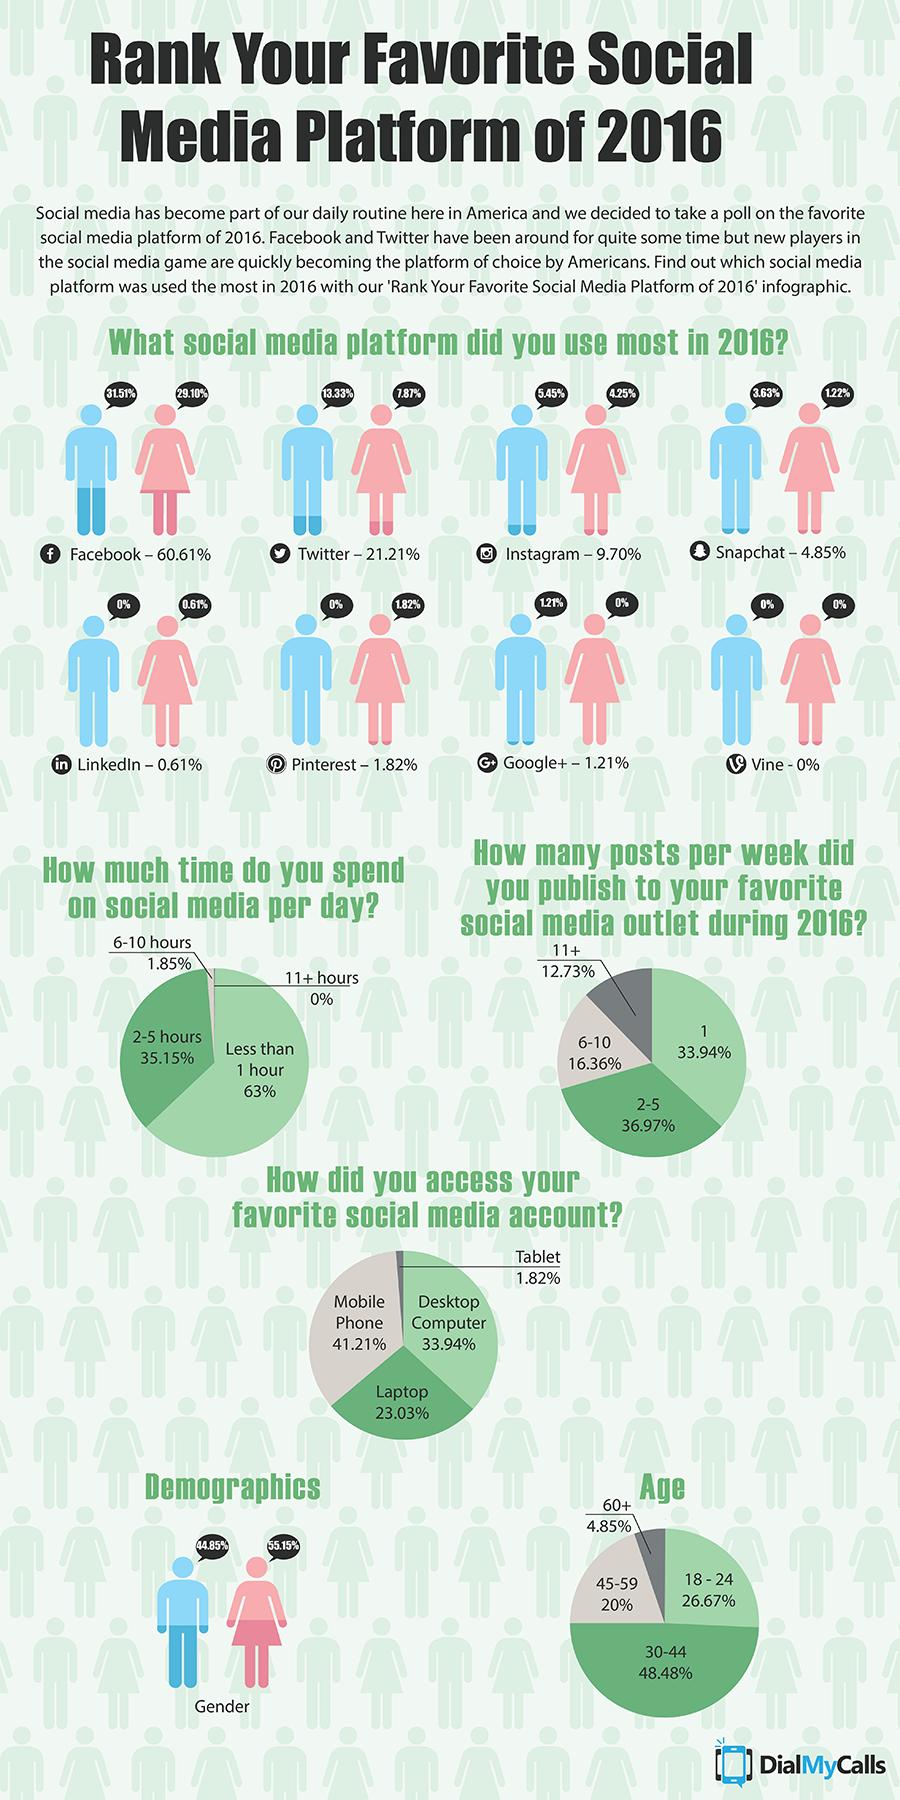 Infographic: Rank Your Favorite Social Media Platform of 2016